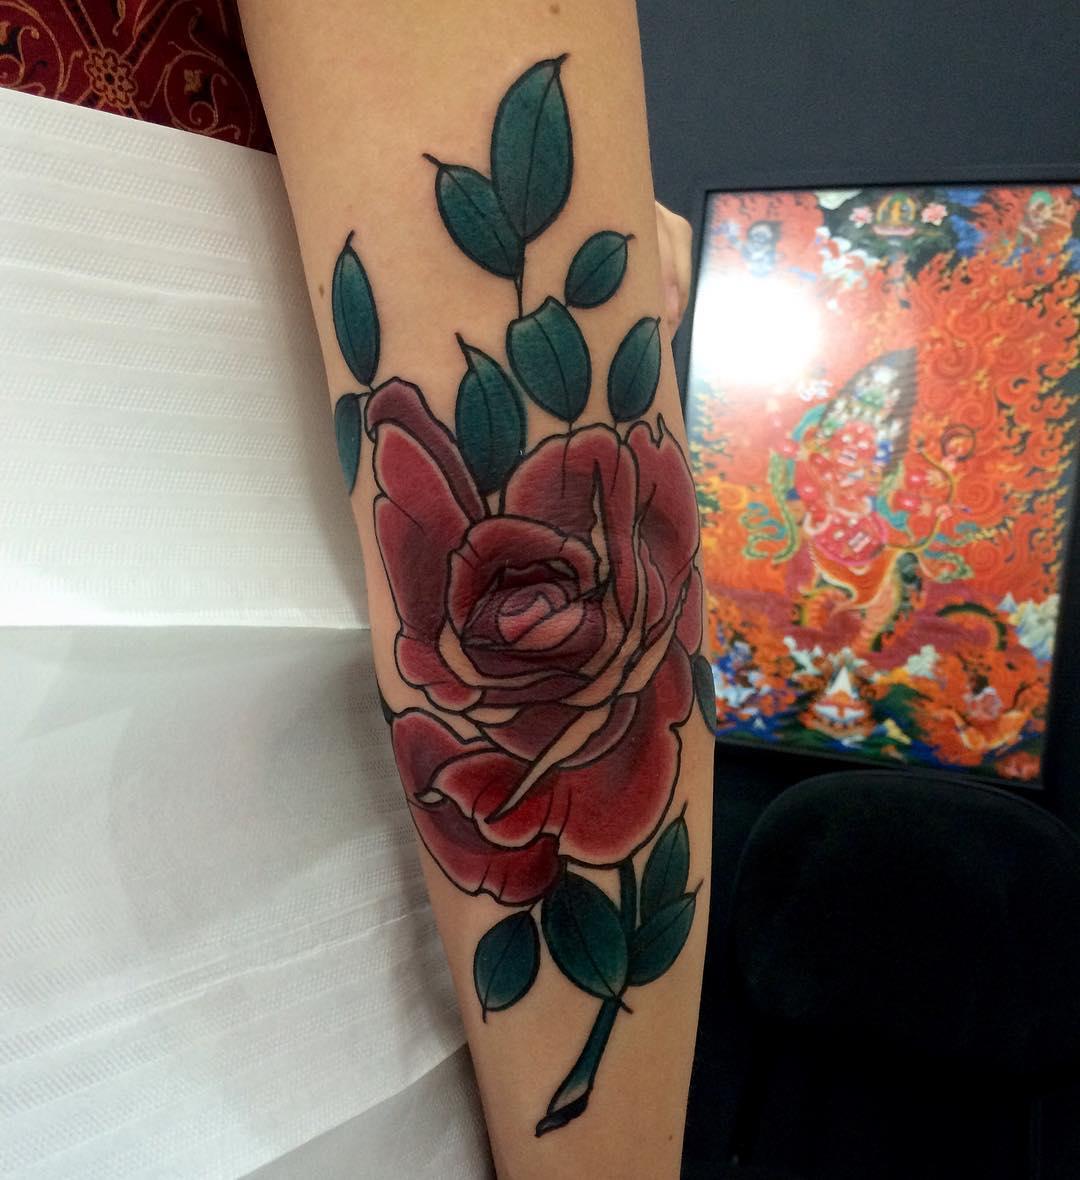 Rose Elbow Tattoo by trindade_luiz